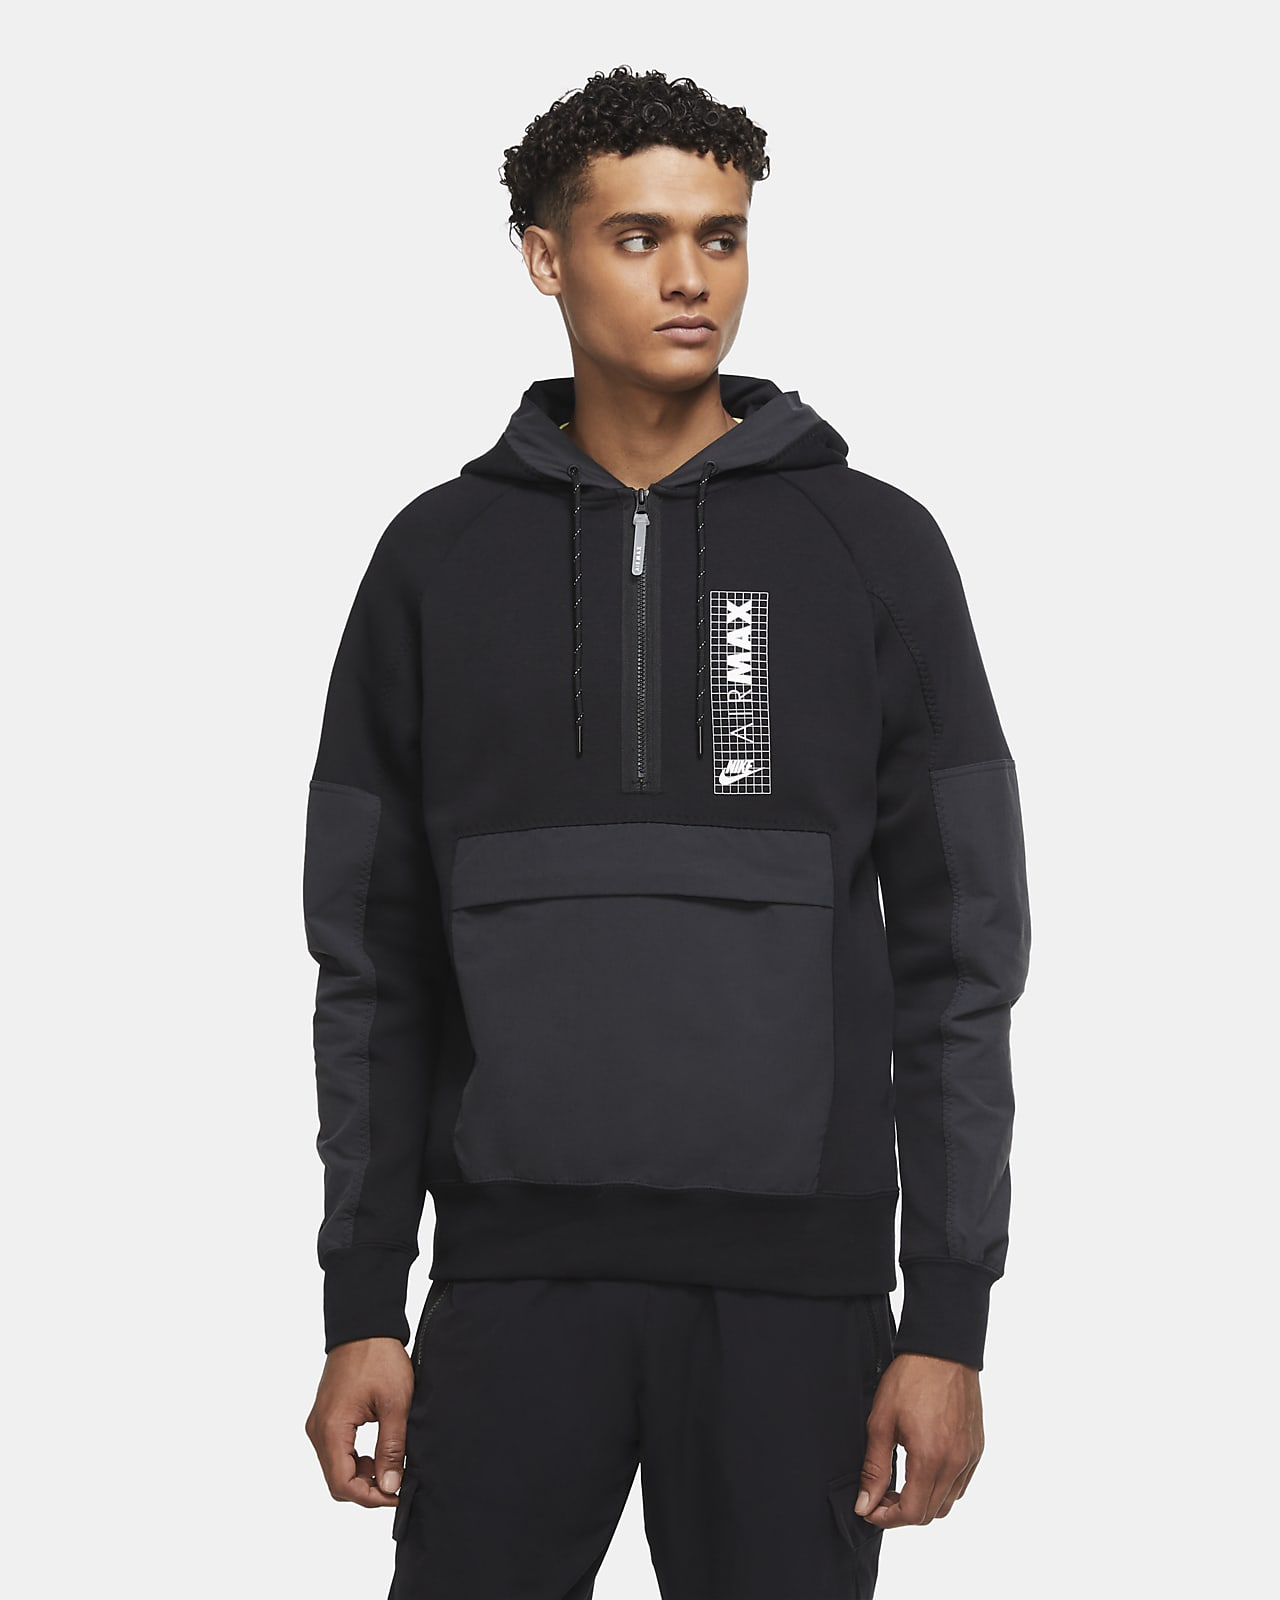 Nike Air Max Camiseta de tejido Fleece con media cremallera - Hombre